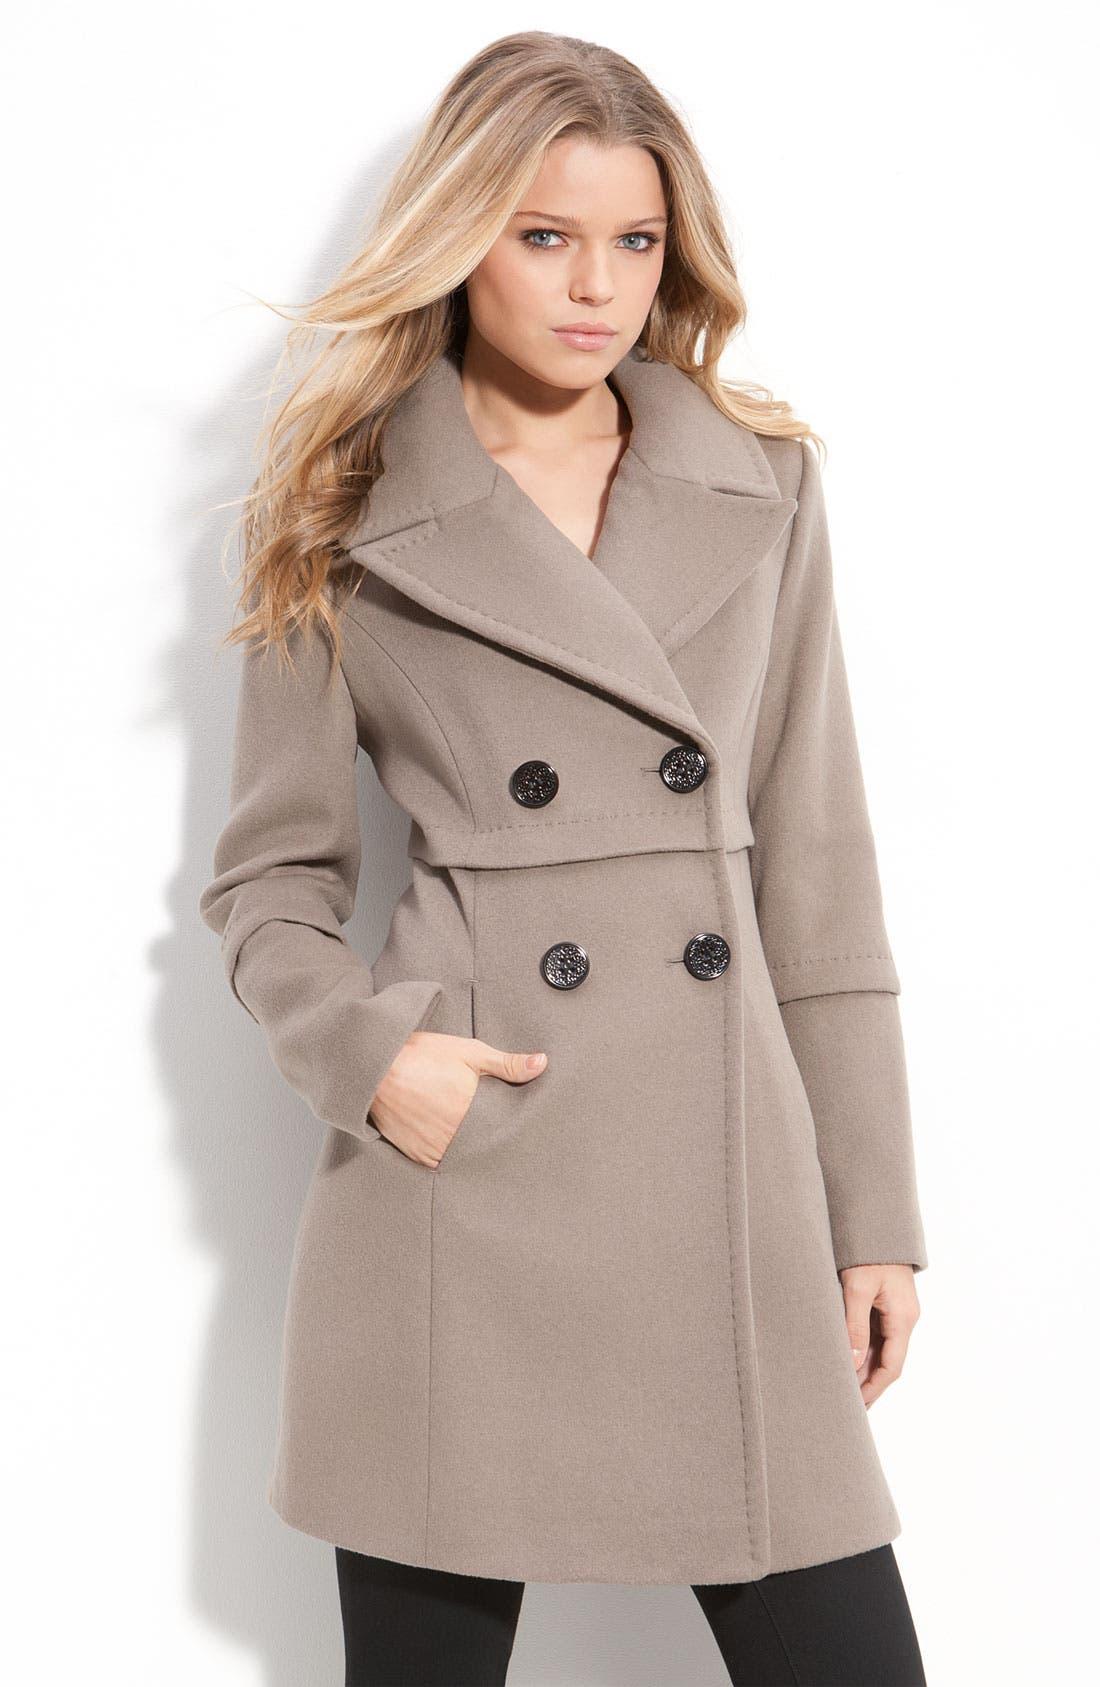 Alternate Image 1 Selected - Elie Tahari Double Breasted Coat